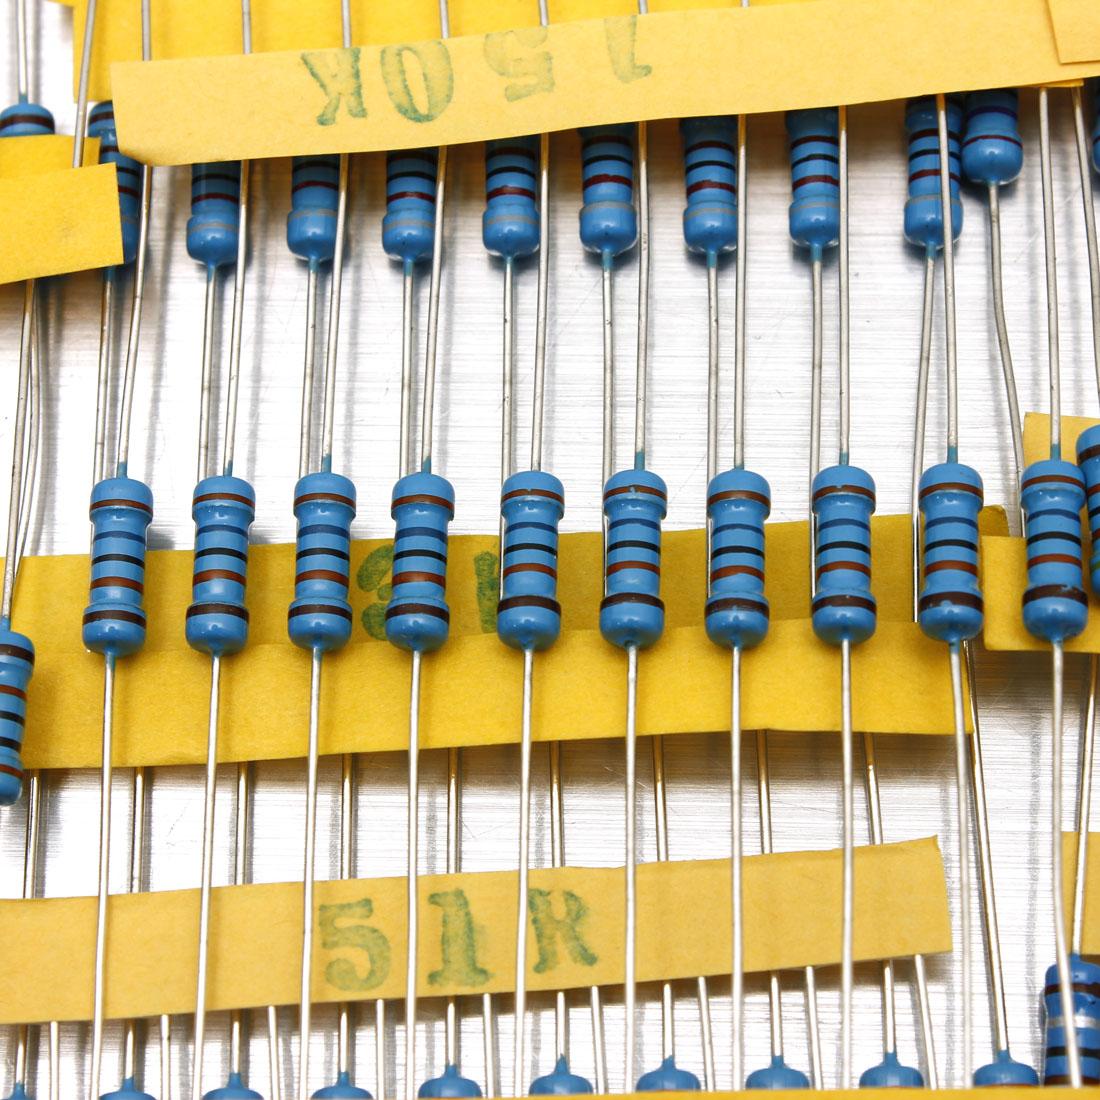 1000Pcs-50-Values-1-2W-0-5W-1-Metal-Film-Resistors-Kit-Assortment-Mix thumbnail 4